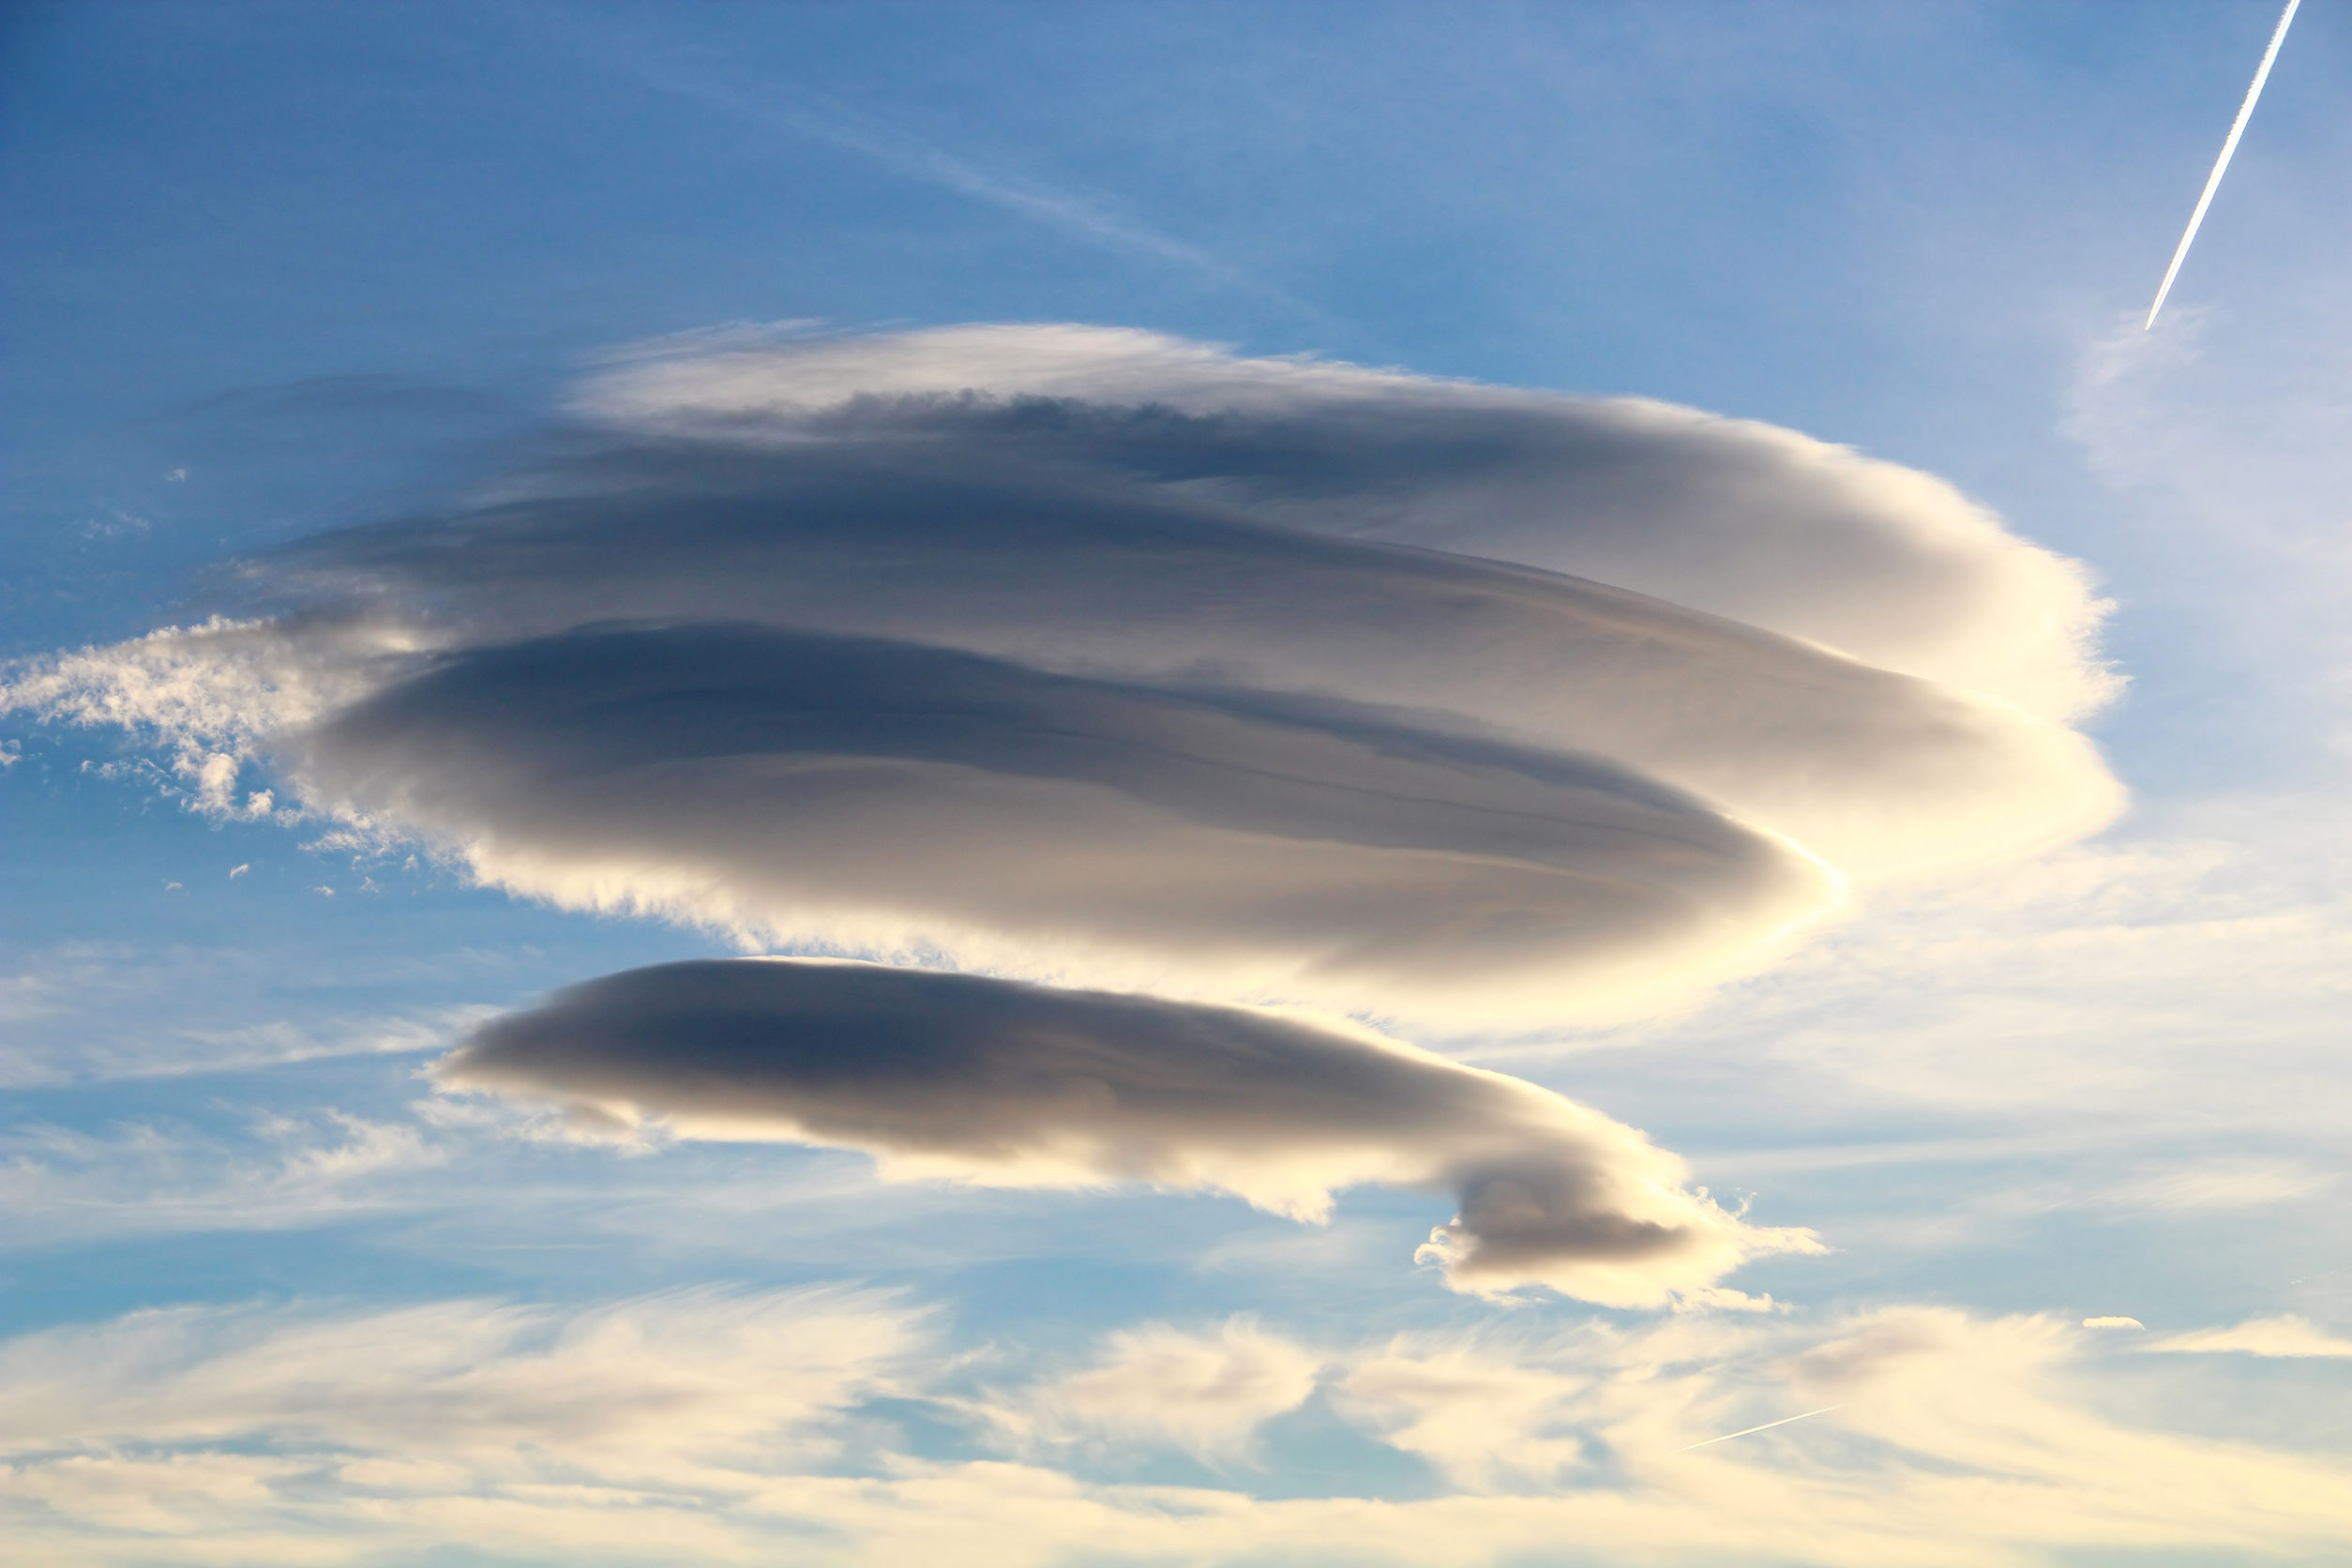 Chmura soczewkowata